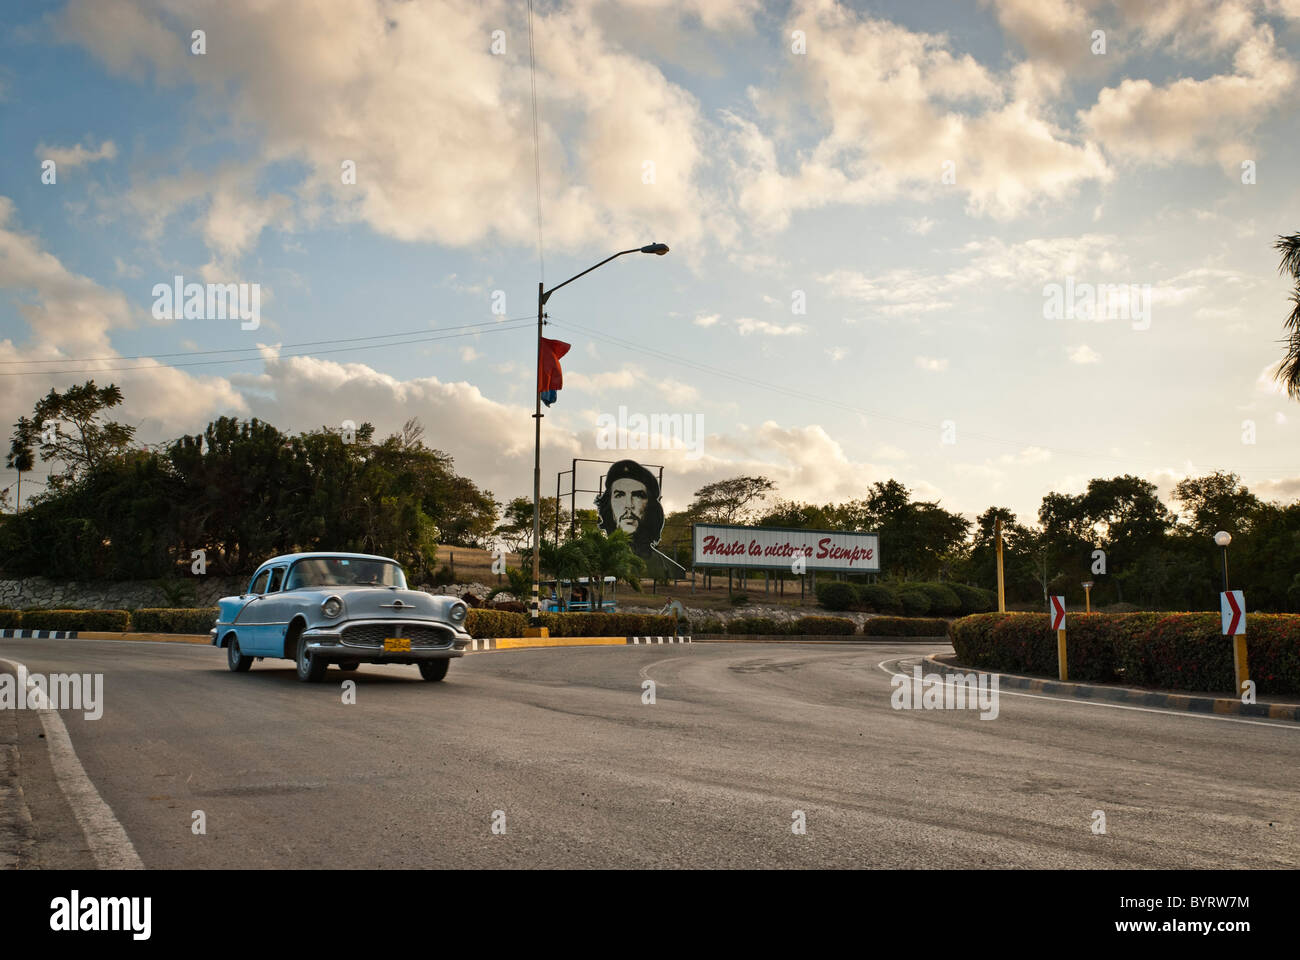 Vintage car driving on a road near Las Tunas near a Che propaganda bill. Las Tunas, Cuba, Caribbean. - Stock Image